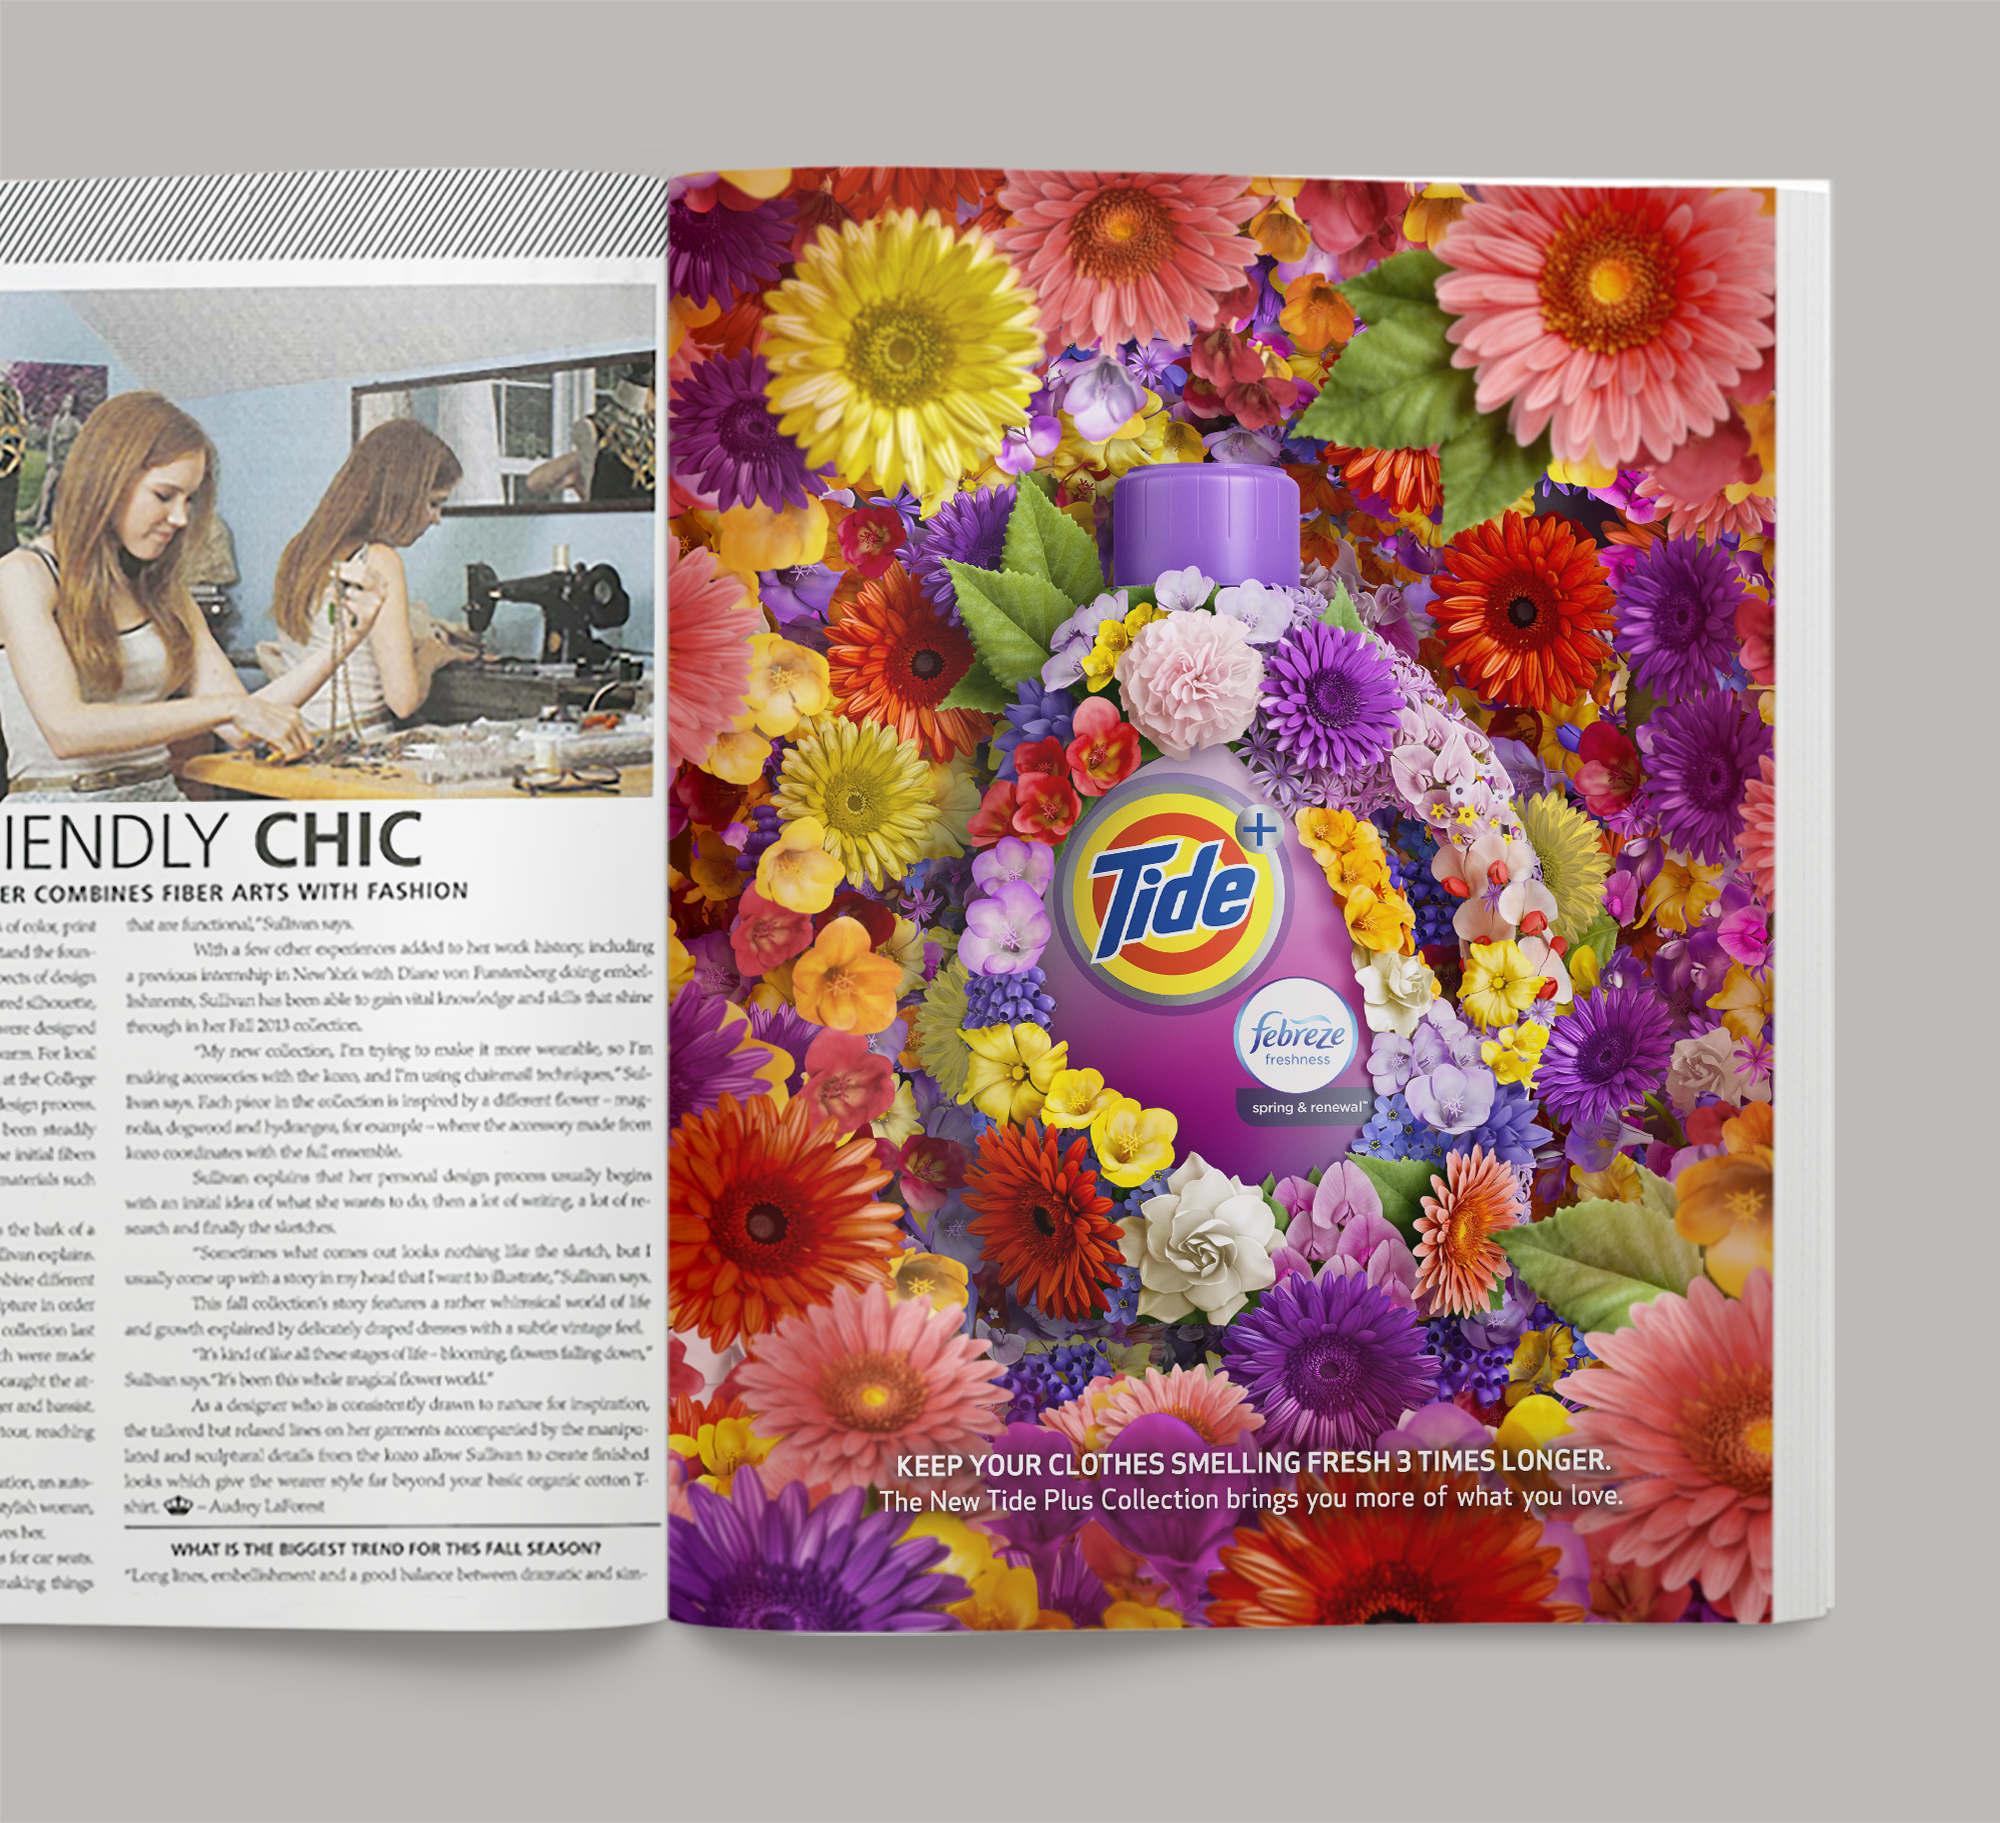 Tide_Febreze_magazine_open_2000px_2000_c.jpg